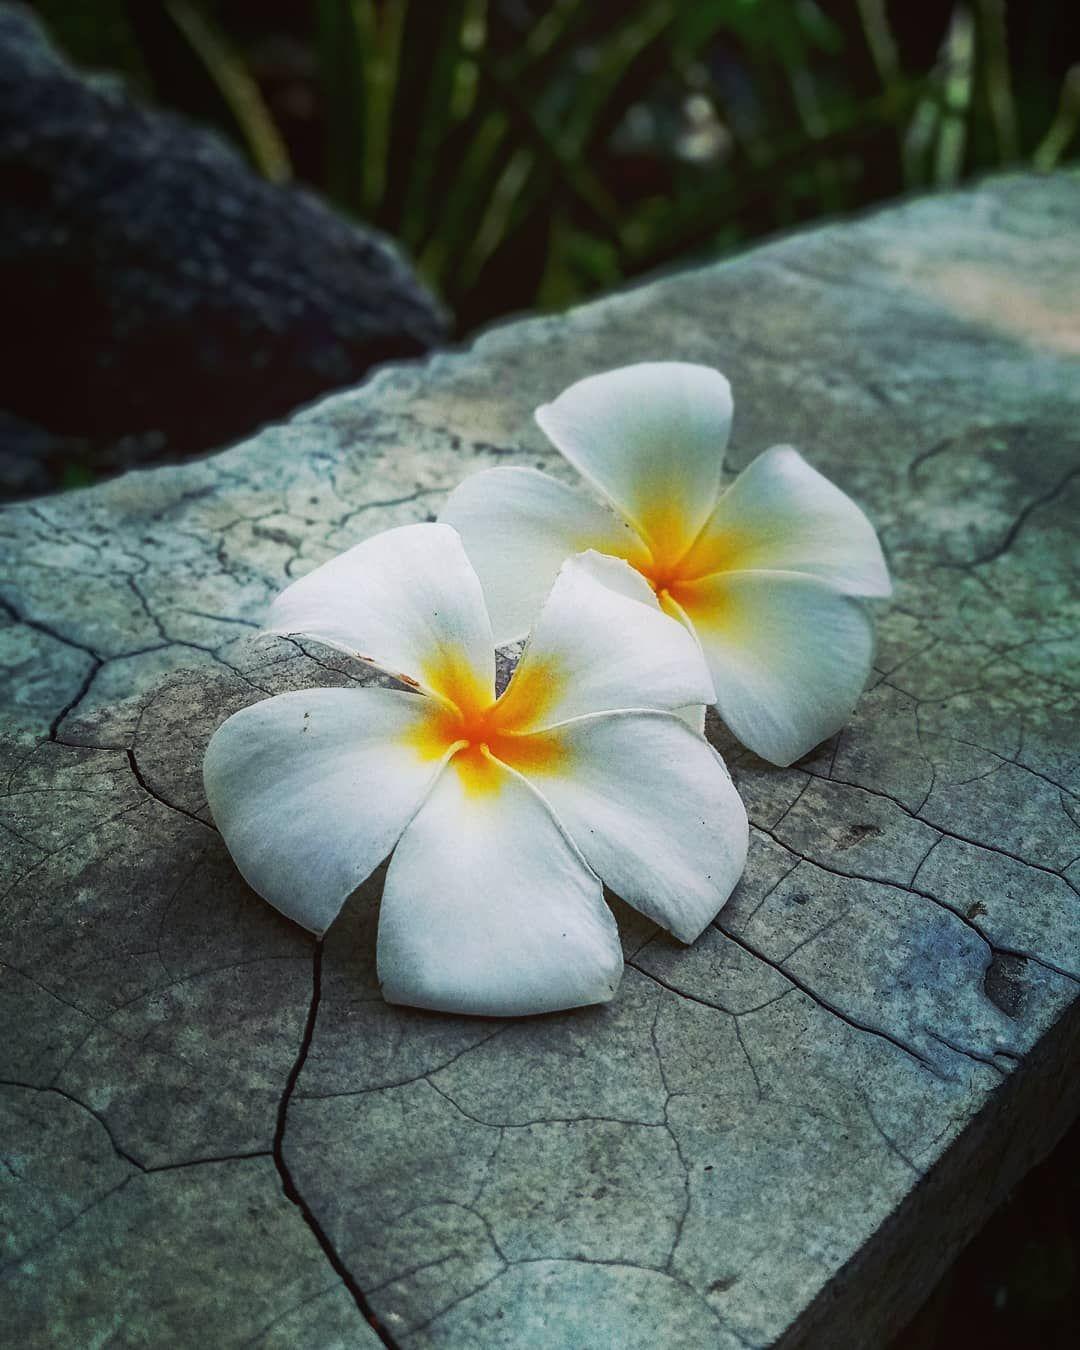 Bunga Bunga Ini Melambangkan Keindahan Pesona Kasih Dan Karunia Bunga Kamboja Dengan Warna Yang Indah Dan Wangi Plants